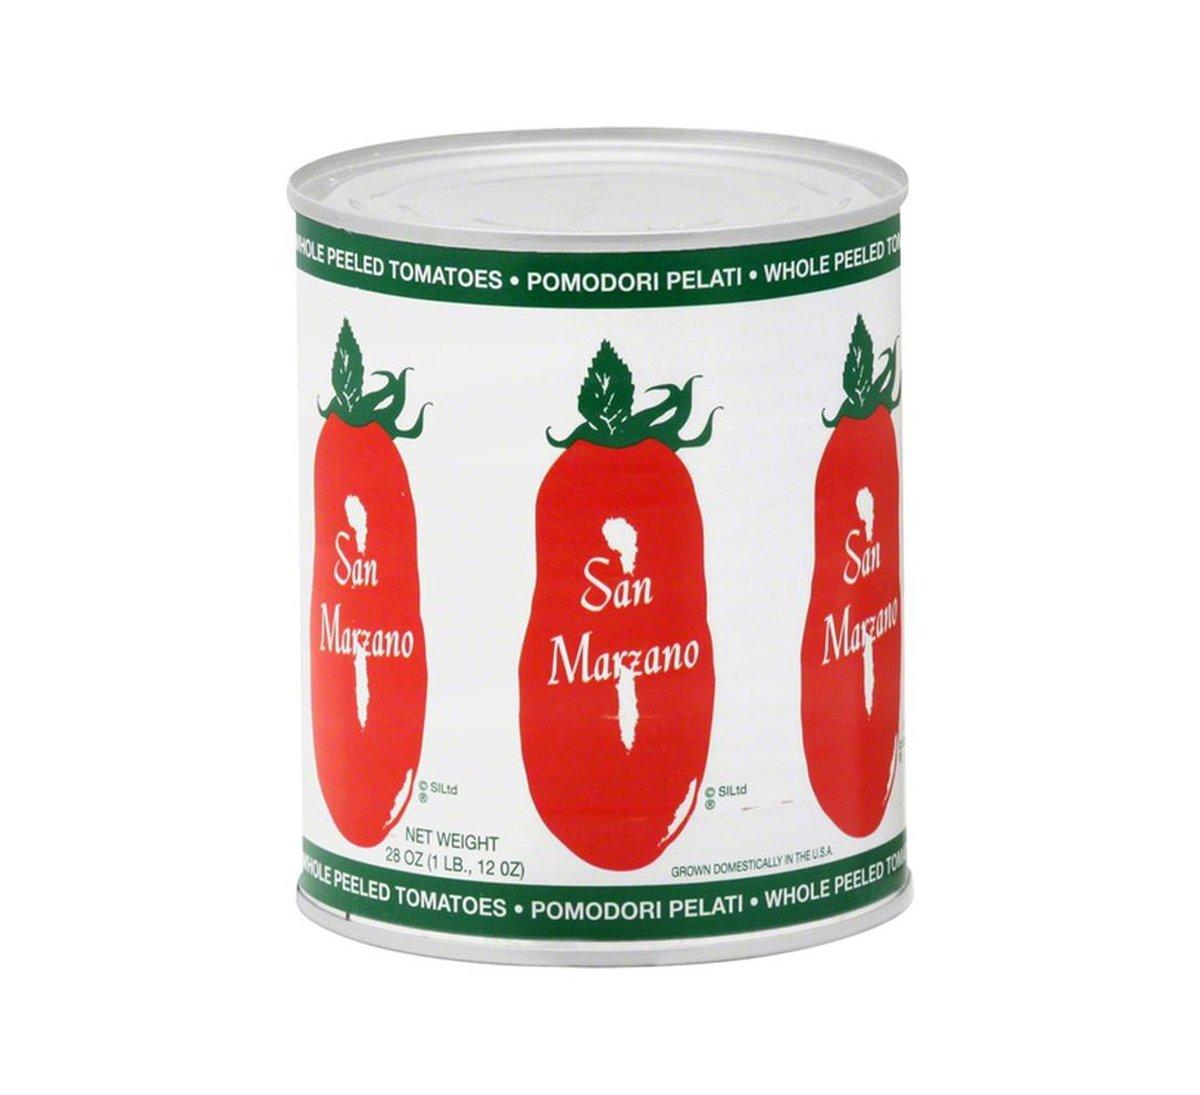 san marzano brand us